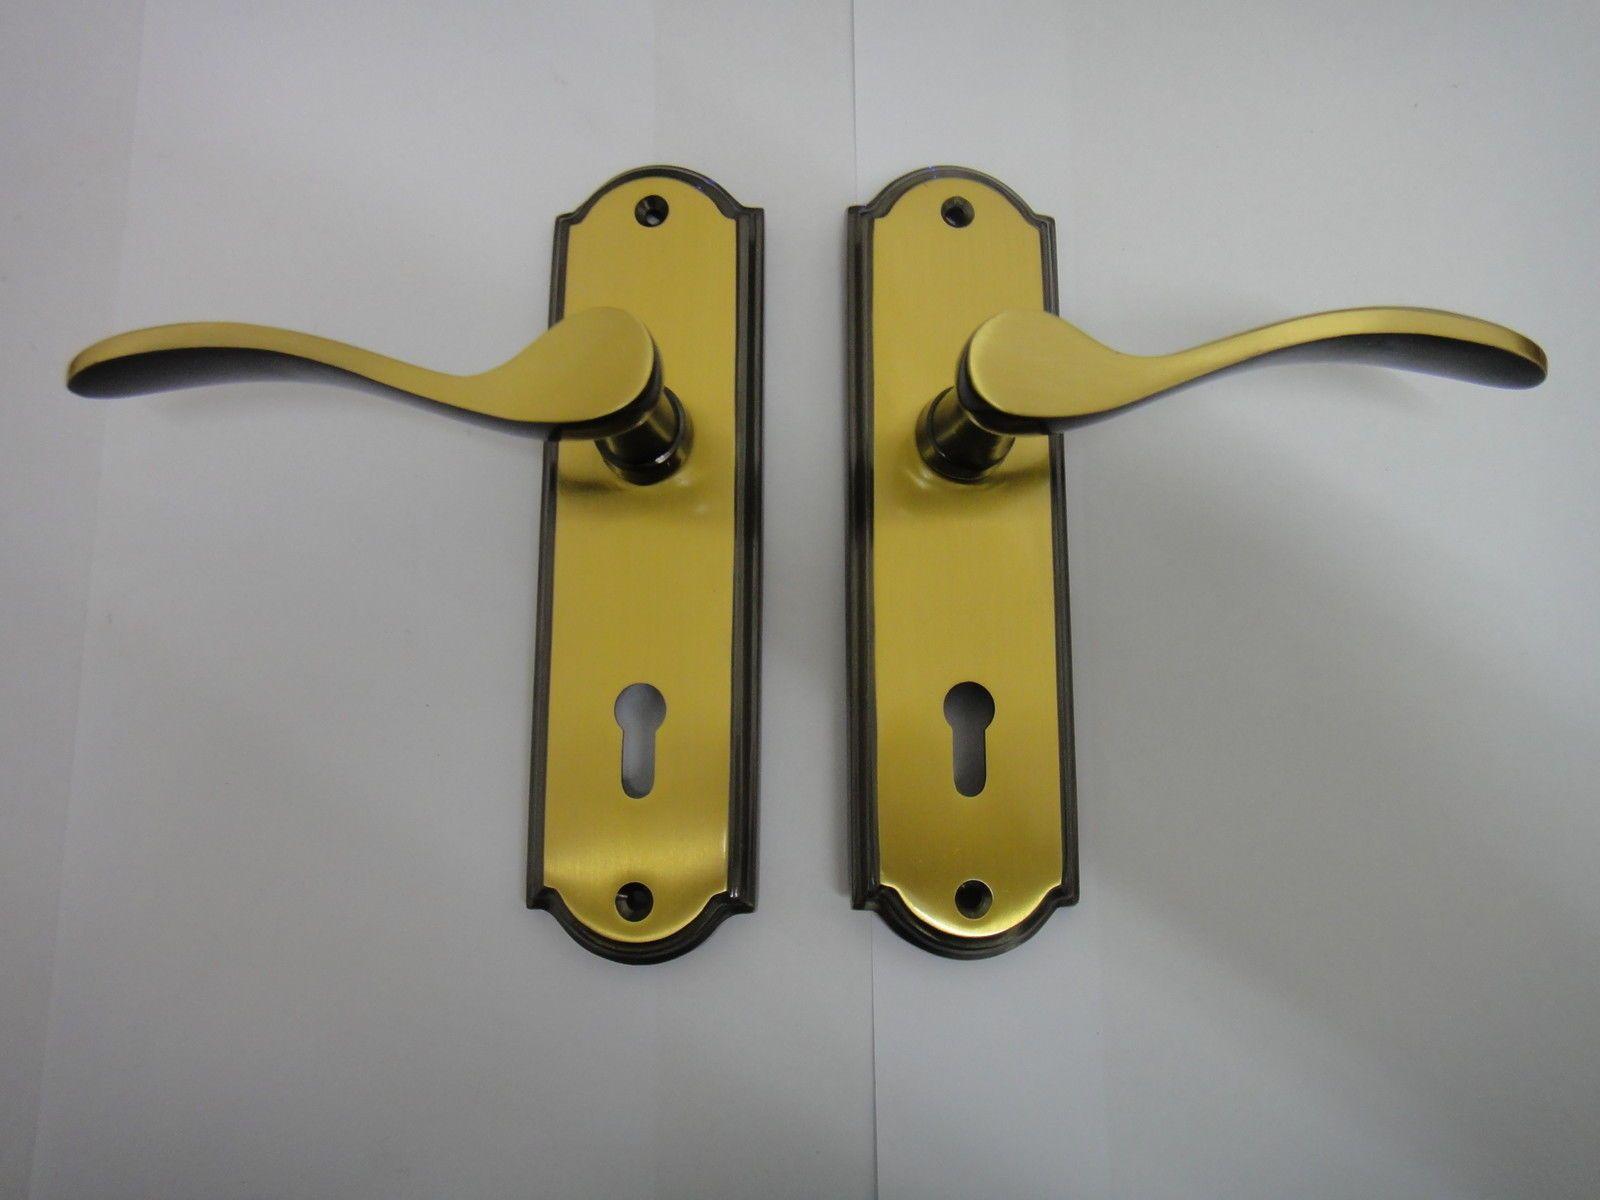 Homebase howard lever lock handle in antique brass finish - new & Homebase howard lever lock handle in antique brass finish - new ...